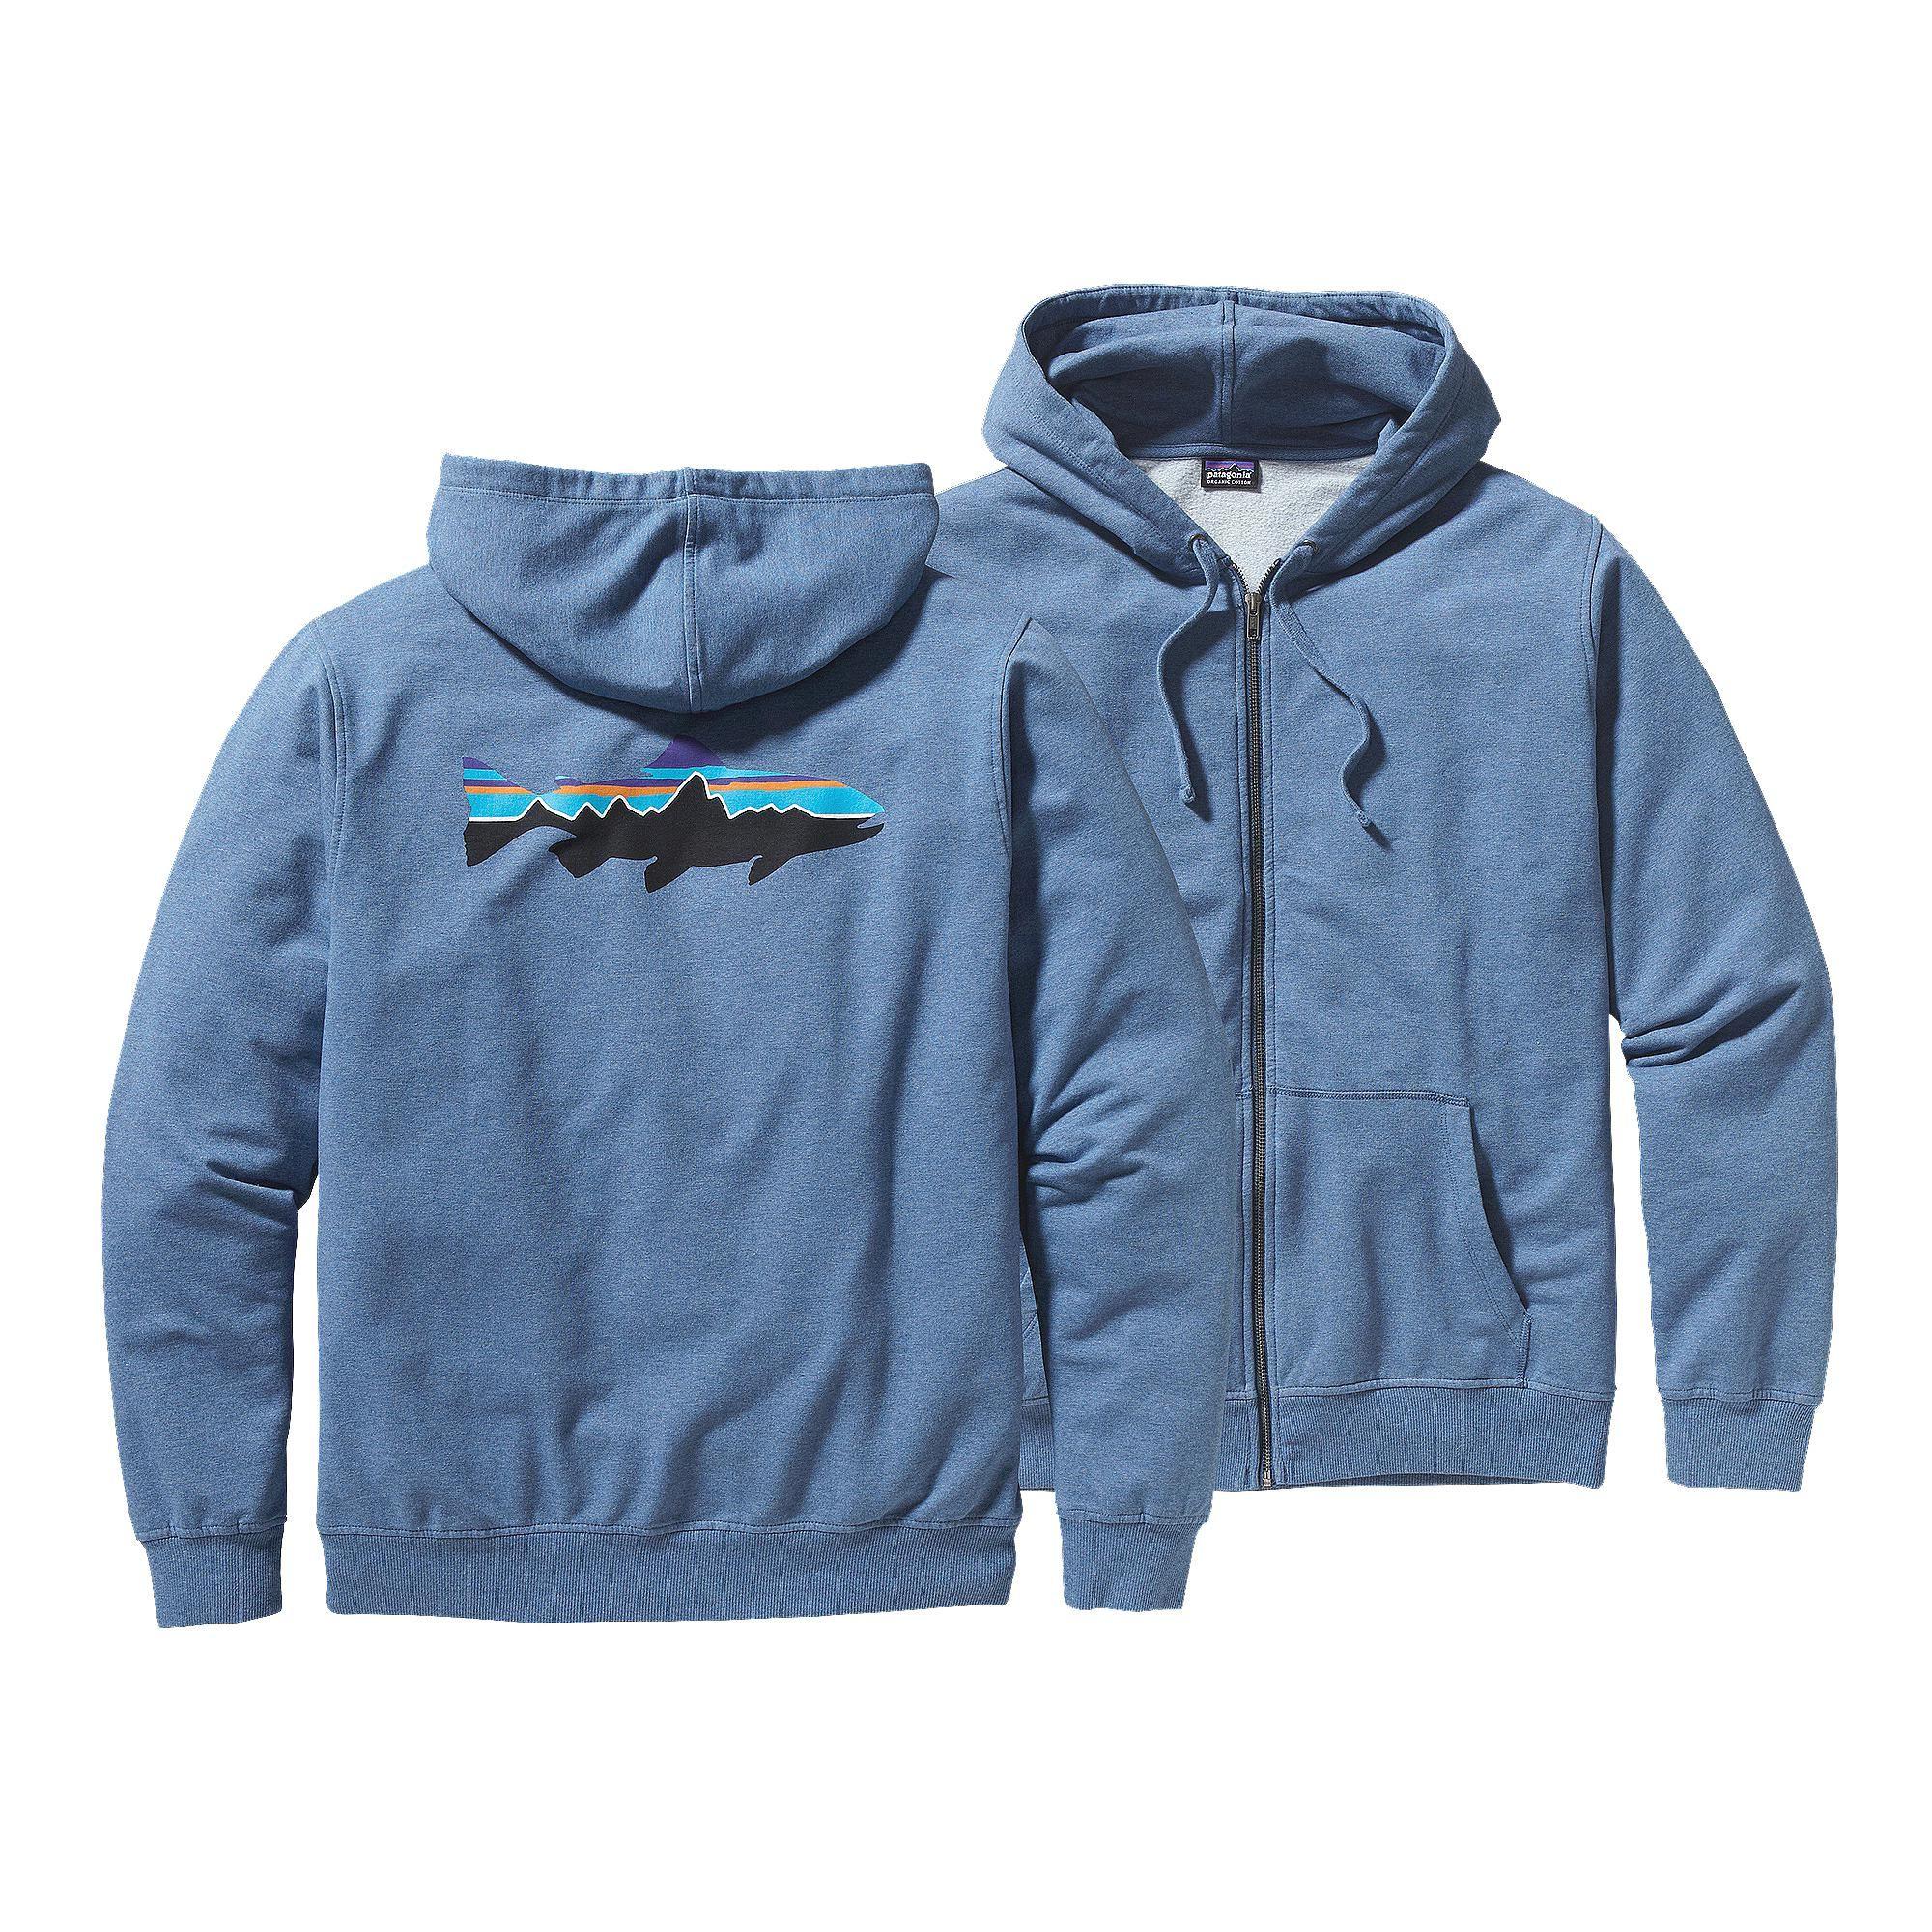 Patagonia Men S Midweight Phone Home Sweatshirt Sweatshirts Mens Outfits Patagonia Mens [ 2000 x 2000 Pixel ]